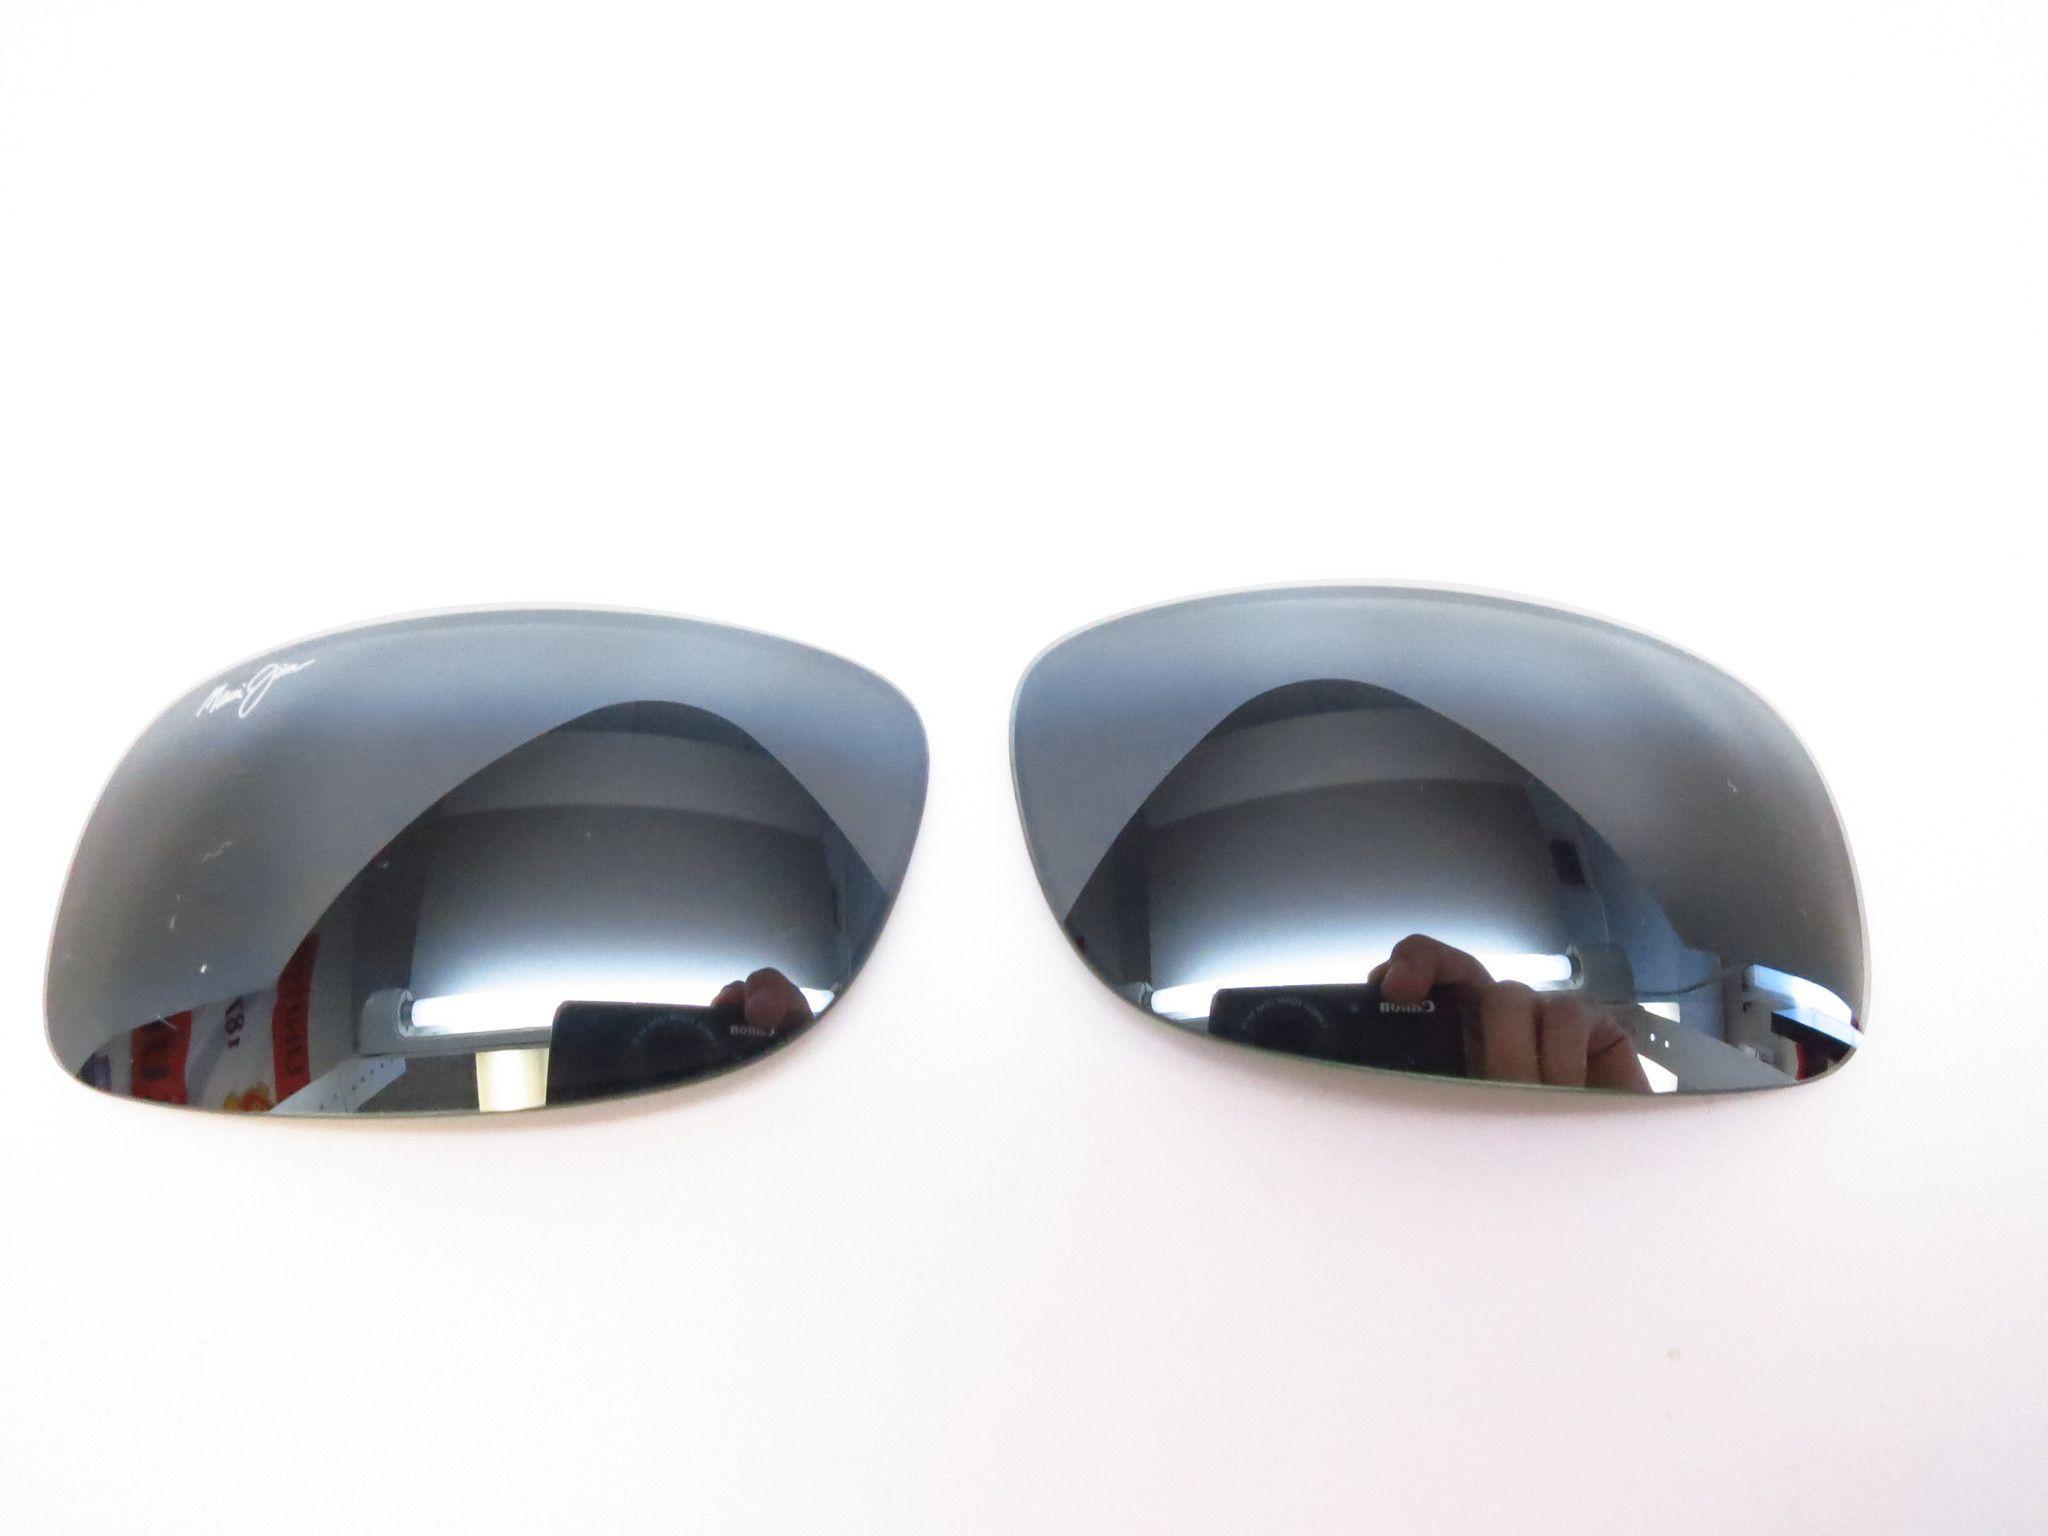 942a6e56df Maui Jim Longboard MJ222 Sunglass Replacement Lenses | Maui Jim ...